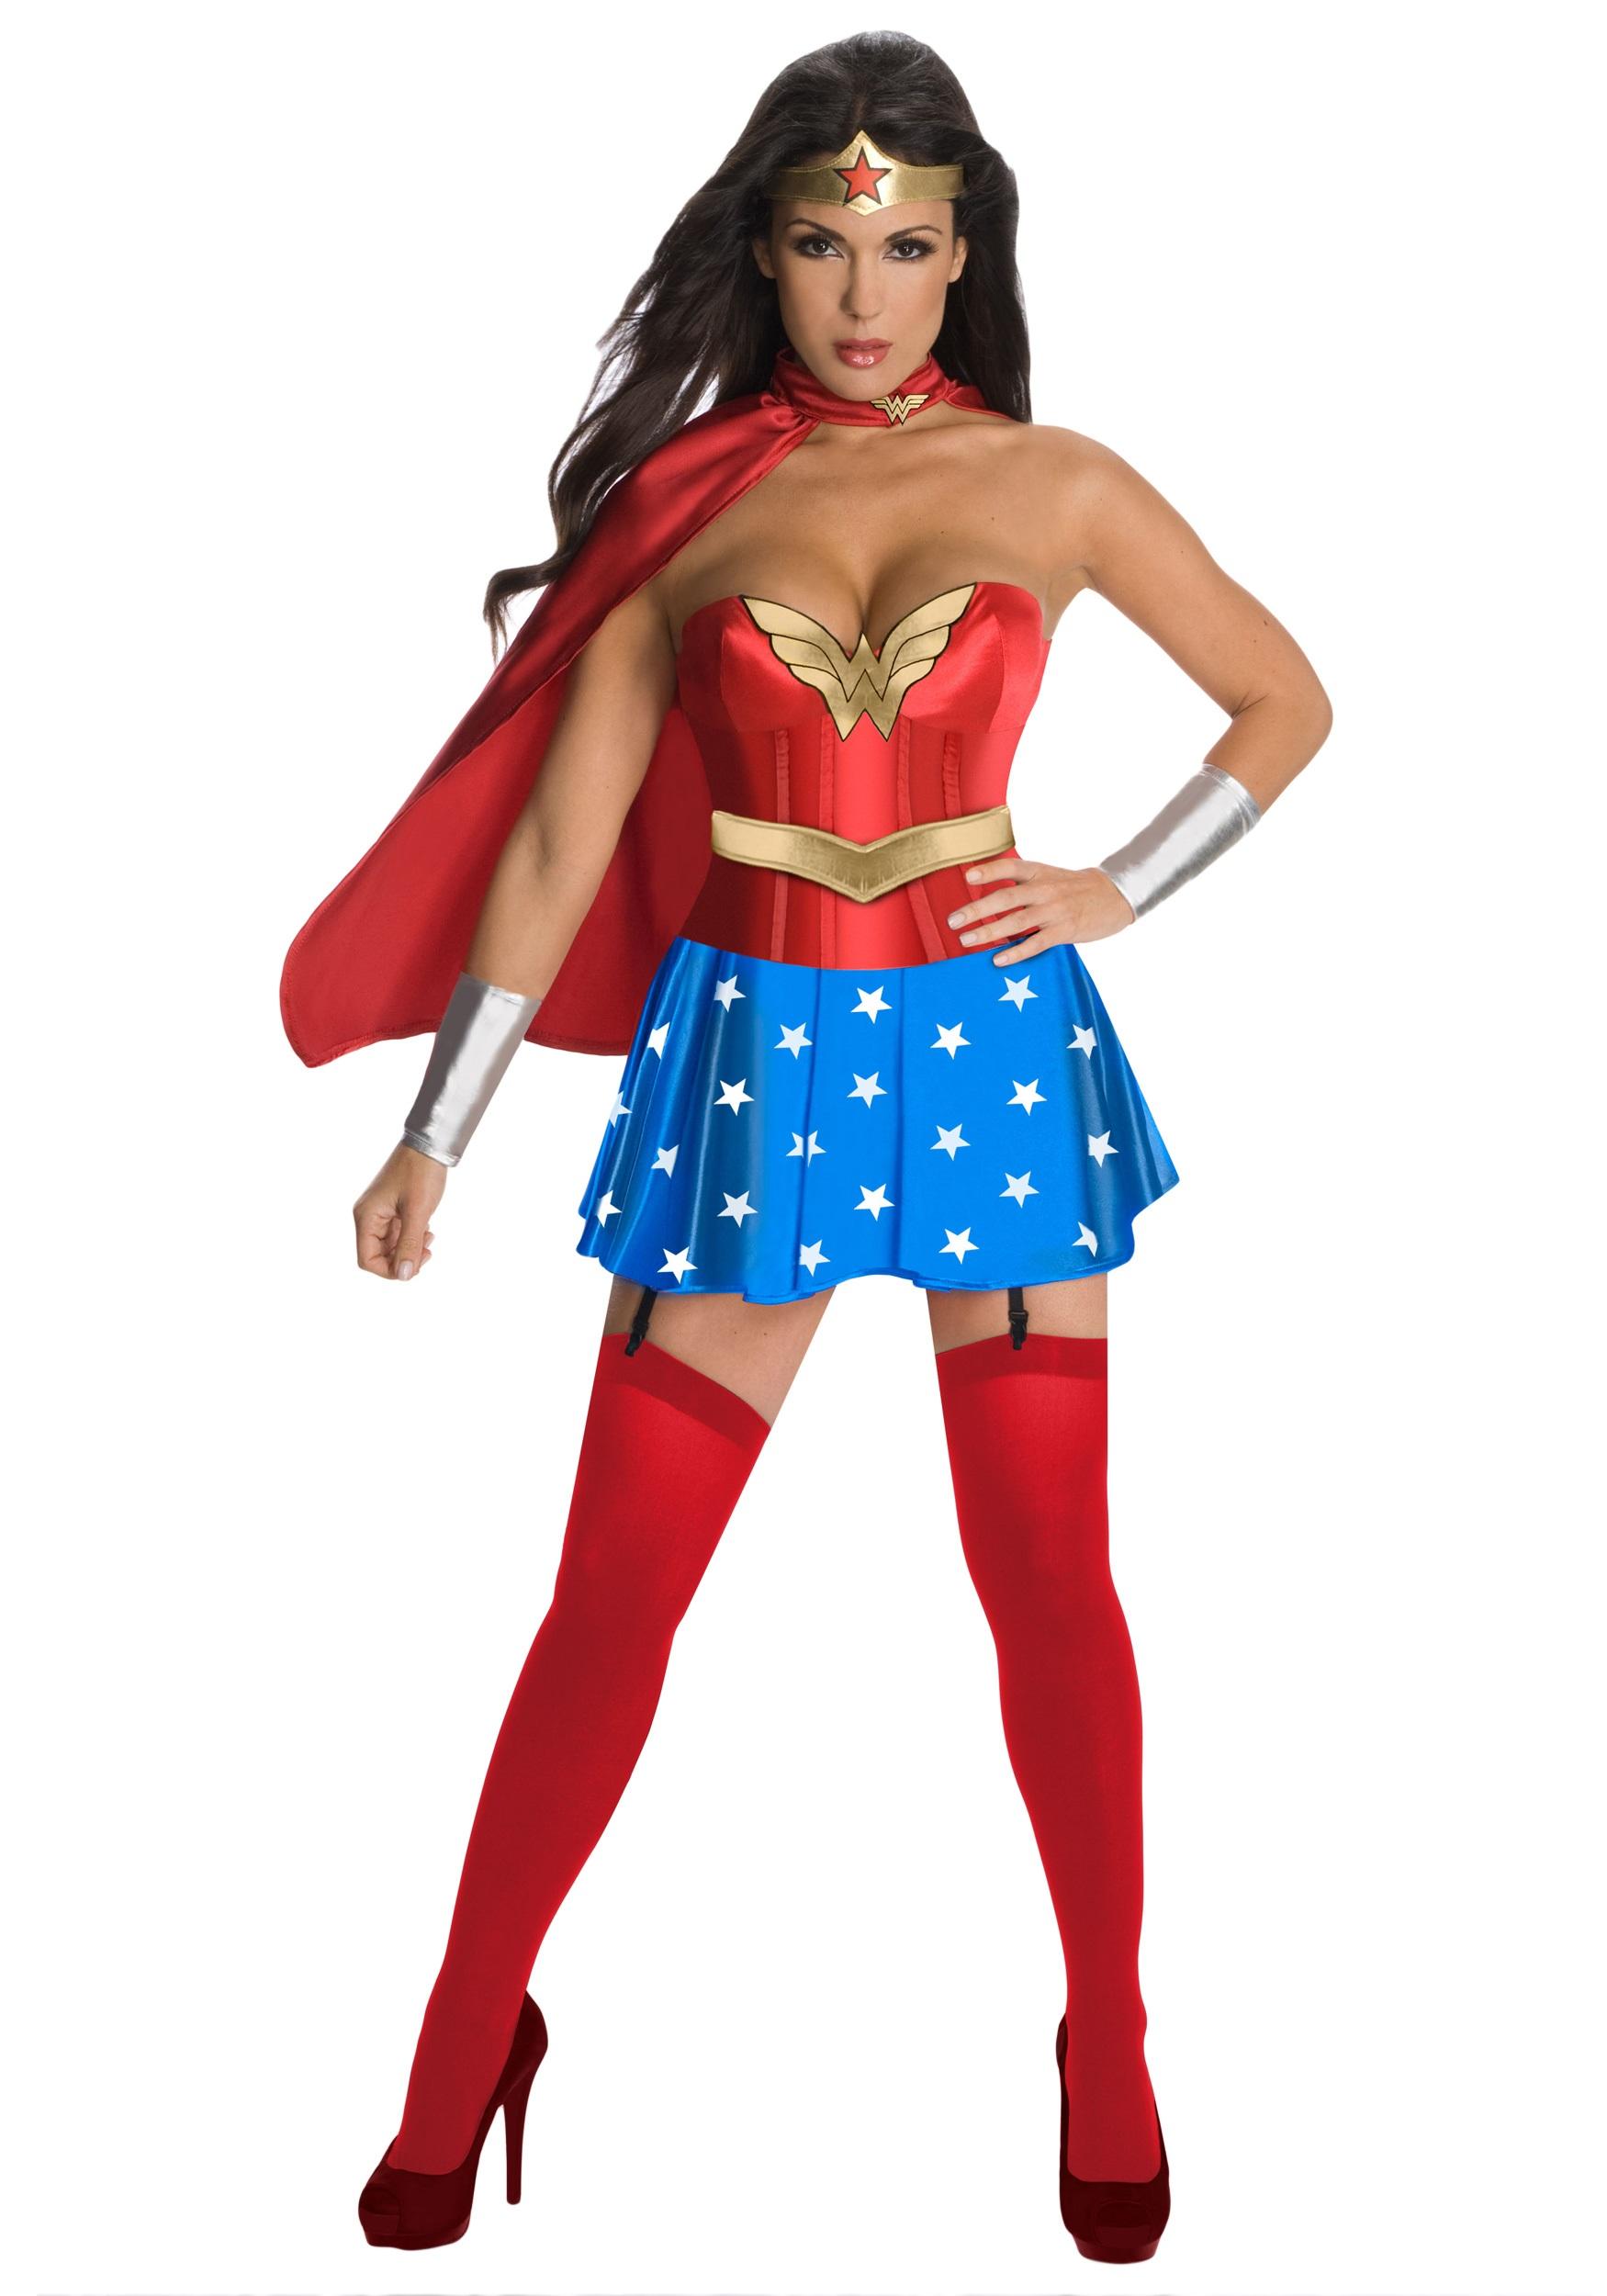 wonder woman sexy corset costume rh fun co uk Wonder Woman Costume Emblem Wonder Woman Costume for Women